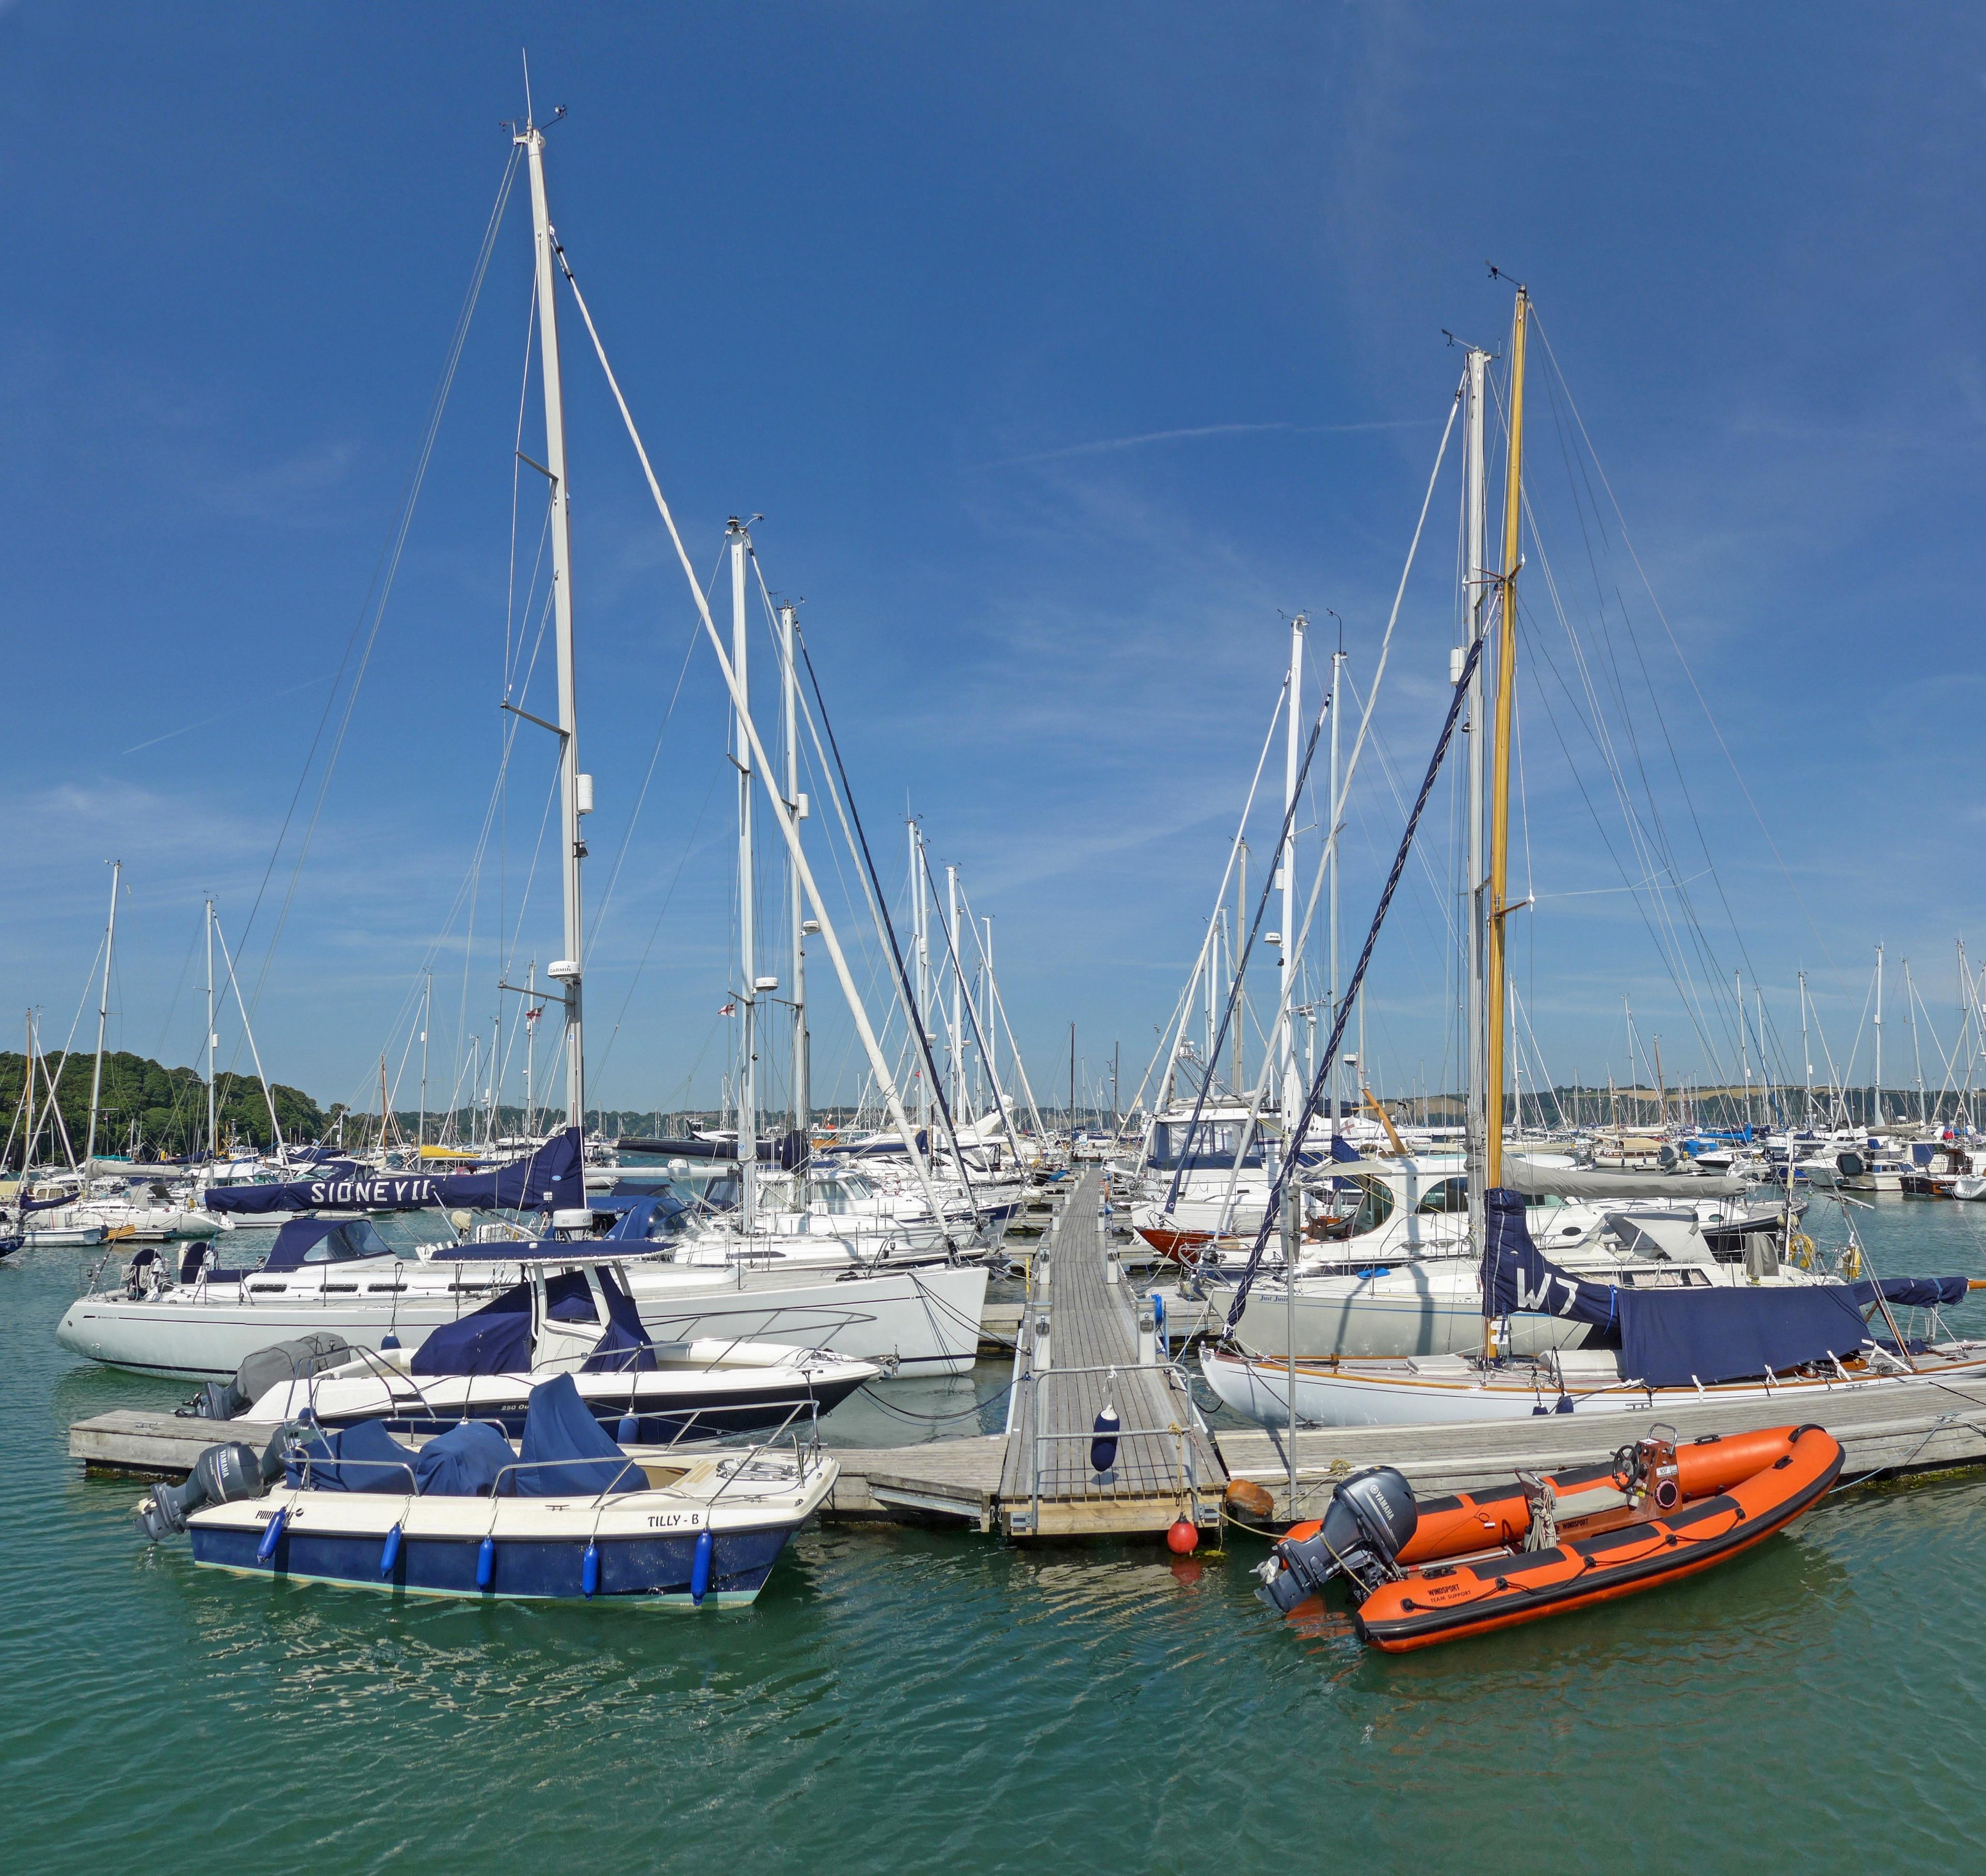 Cornwall, England, United Kingdom